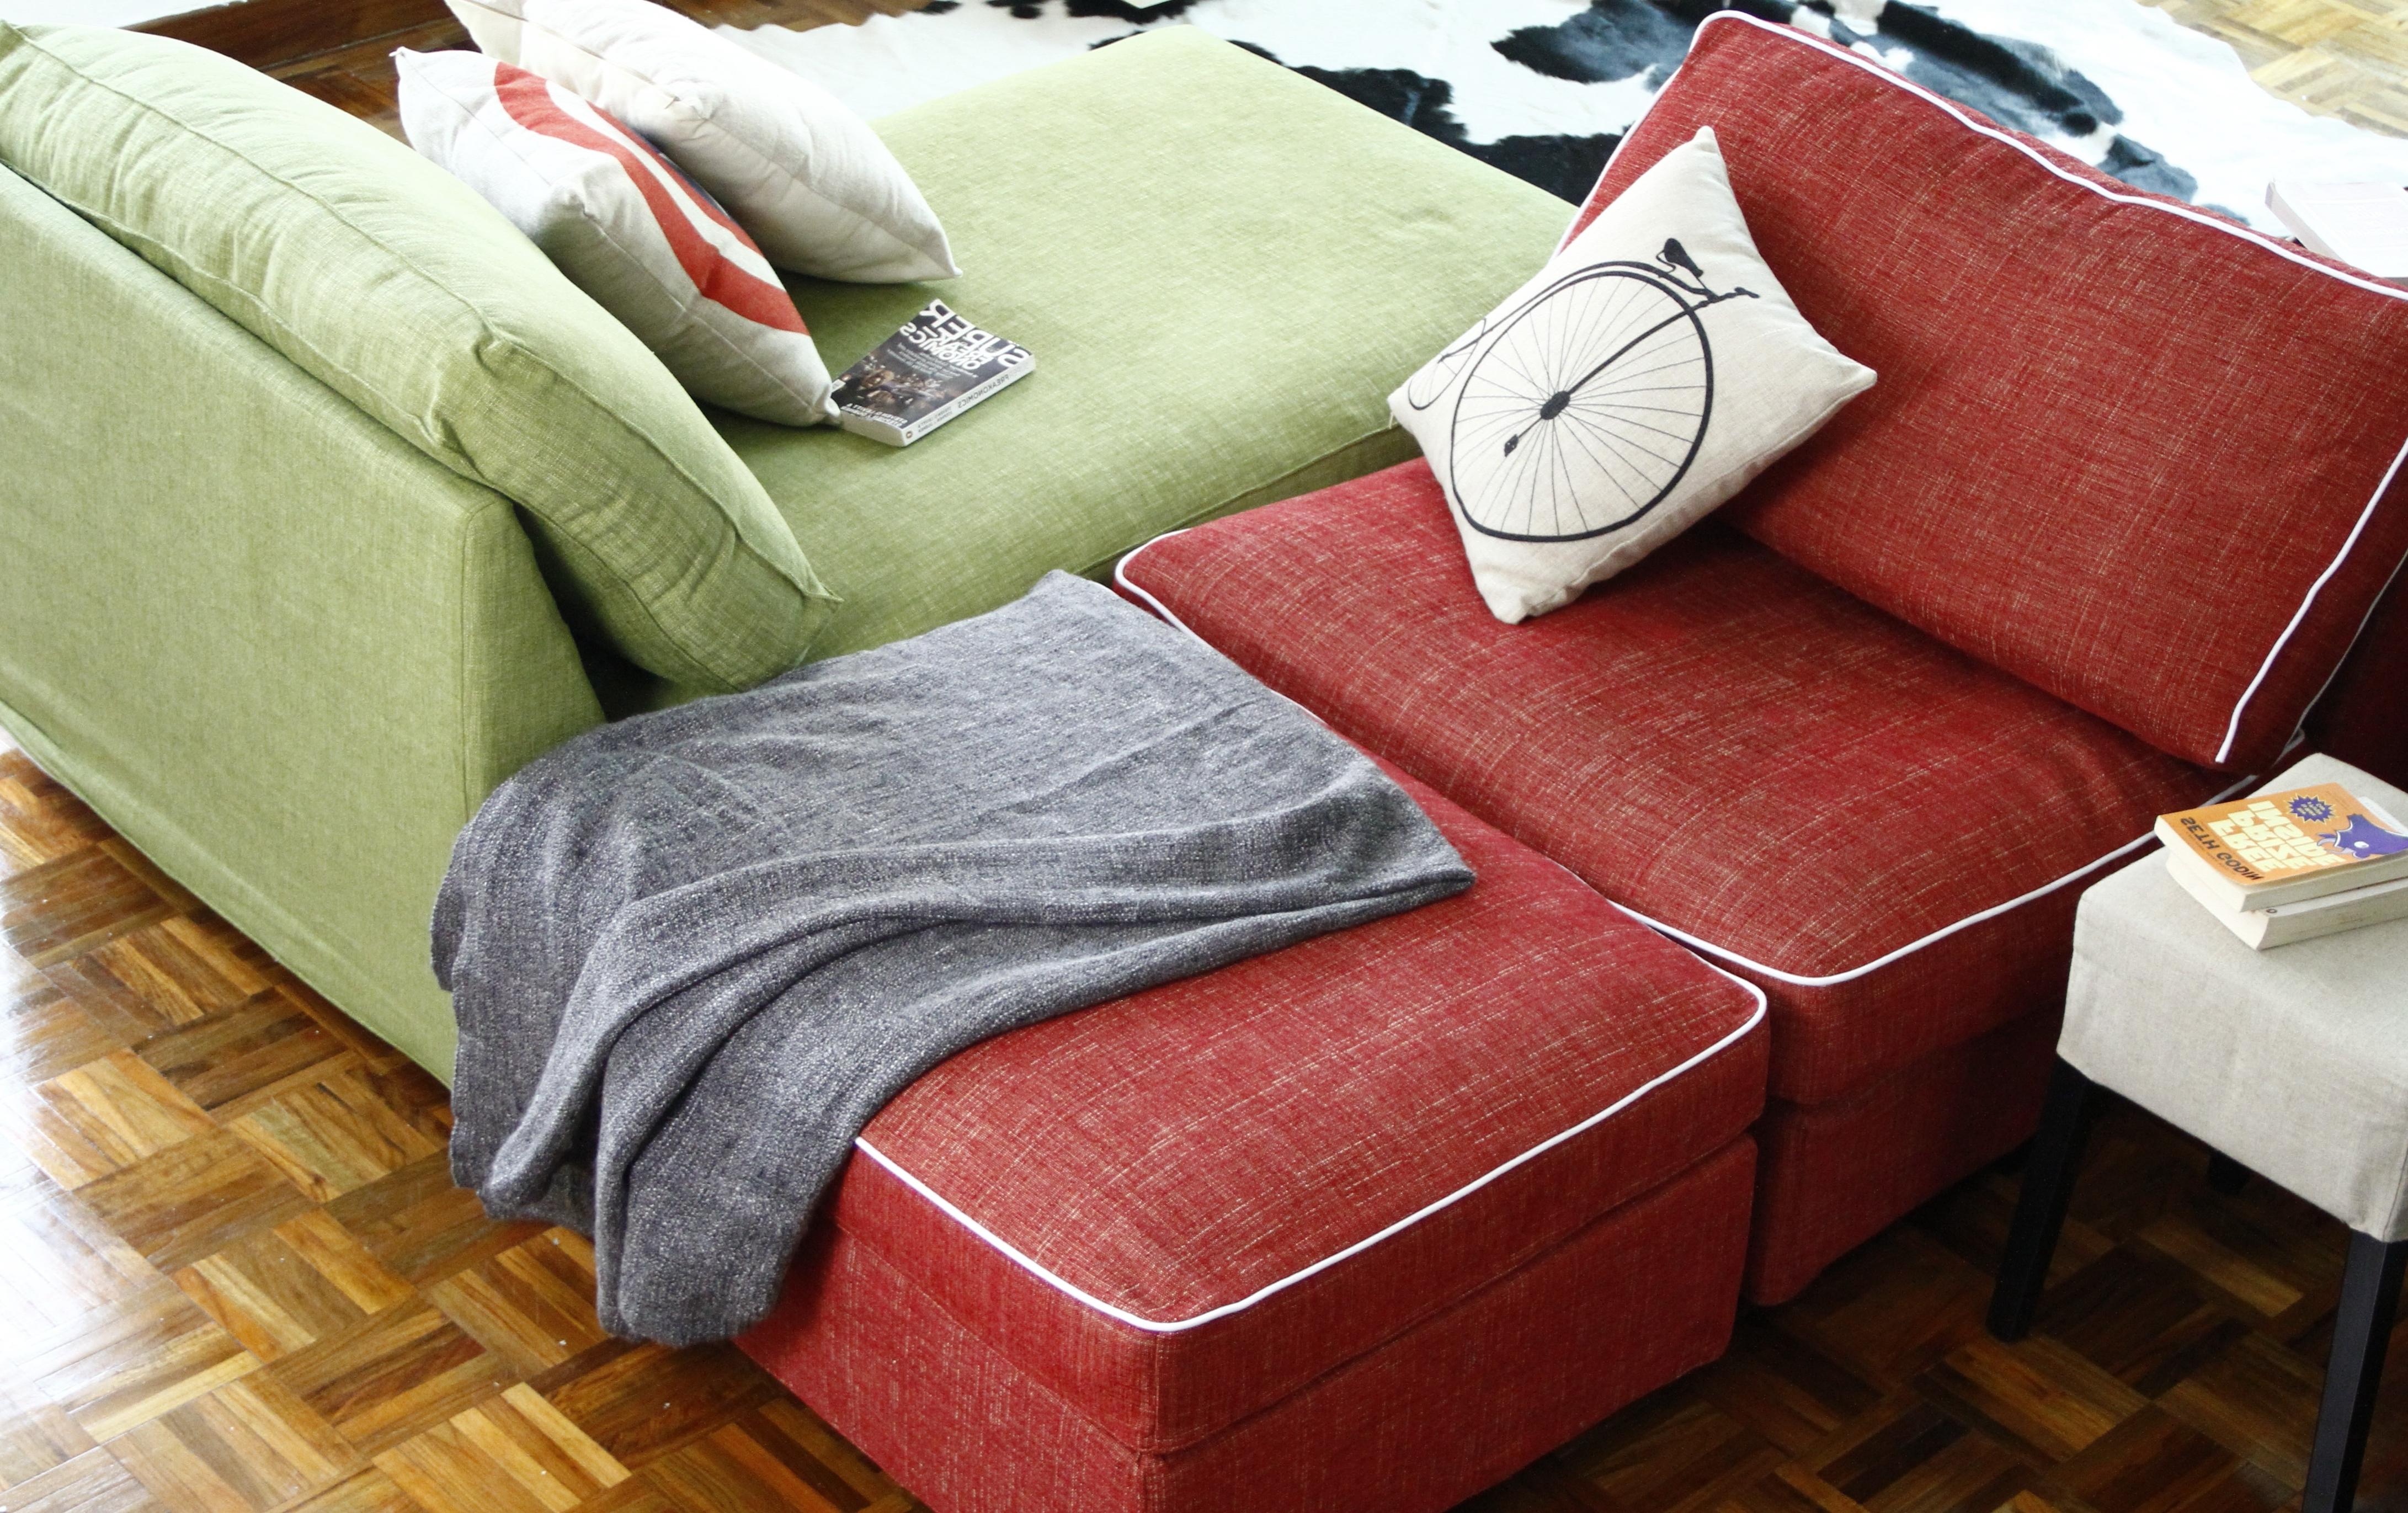 Latest Ikea Kivik Sofa Series Review – Comfort Works Blog & Design For Kivik Chaises (View 9 of 15)